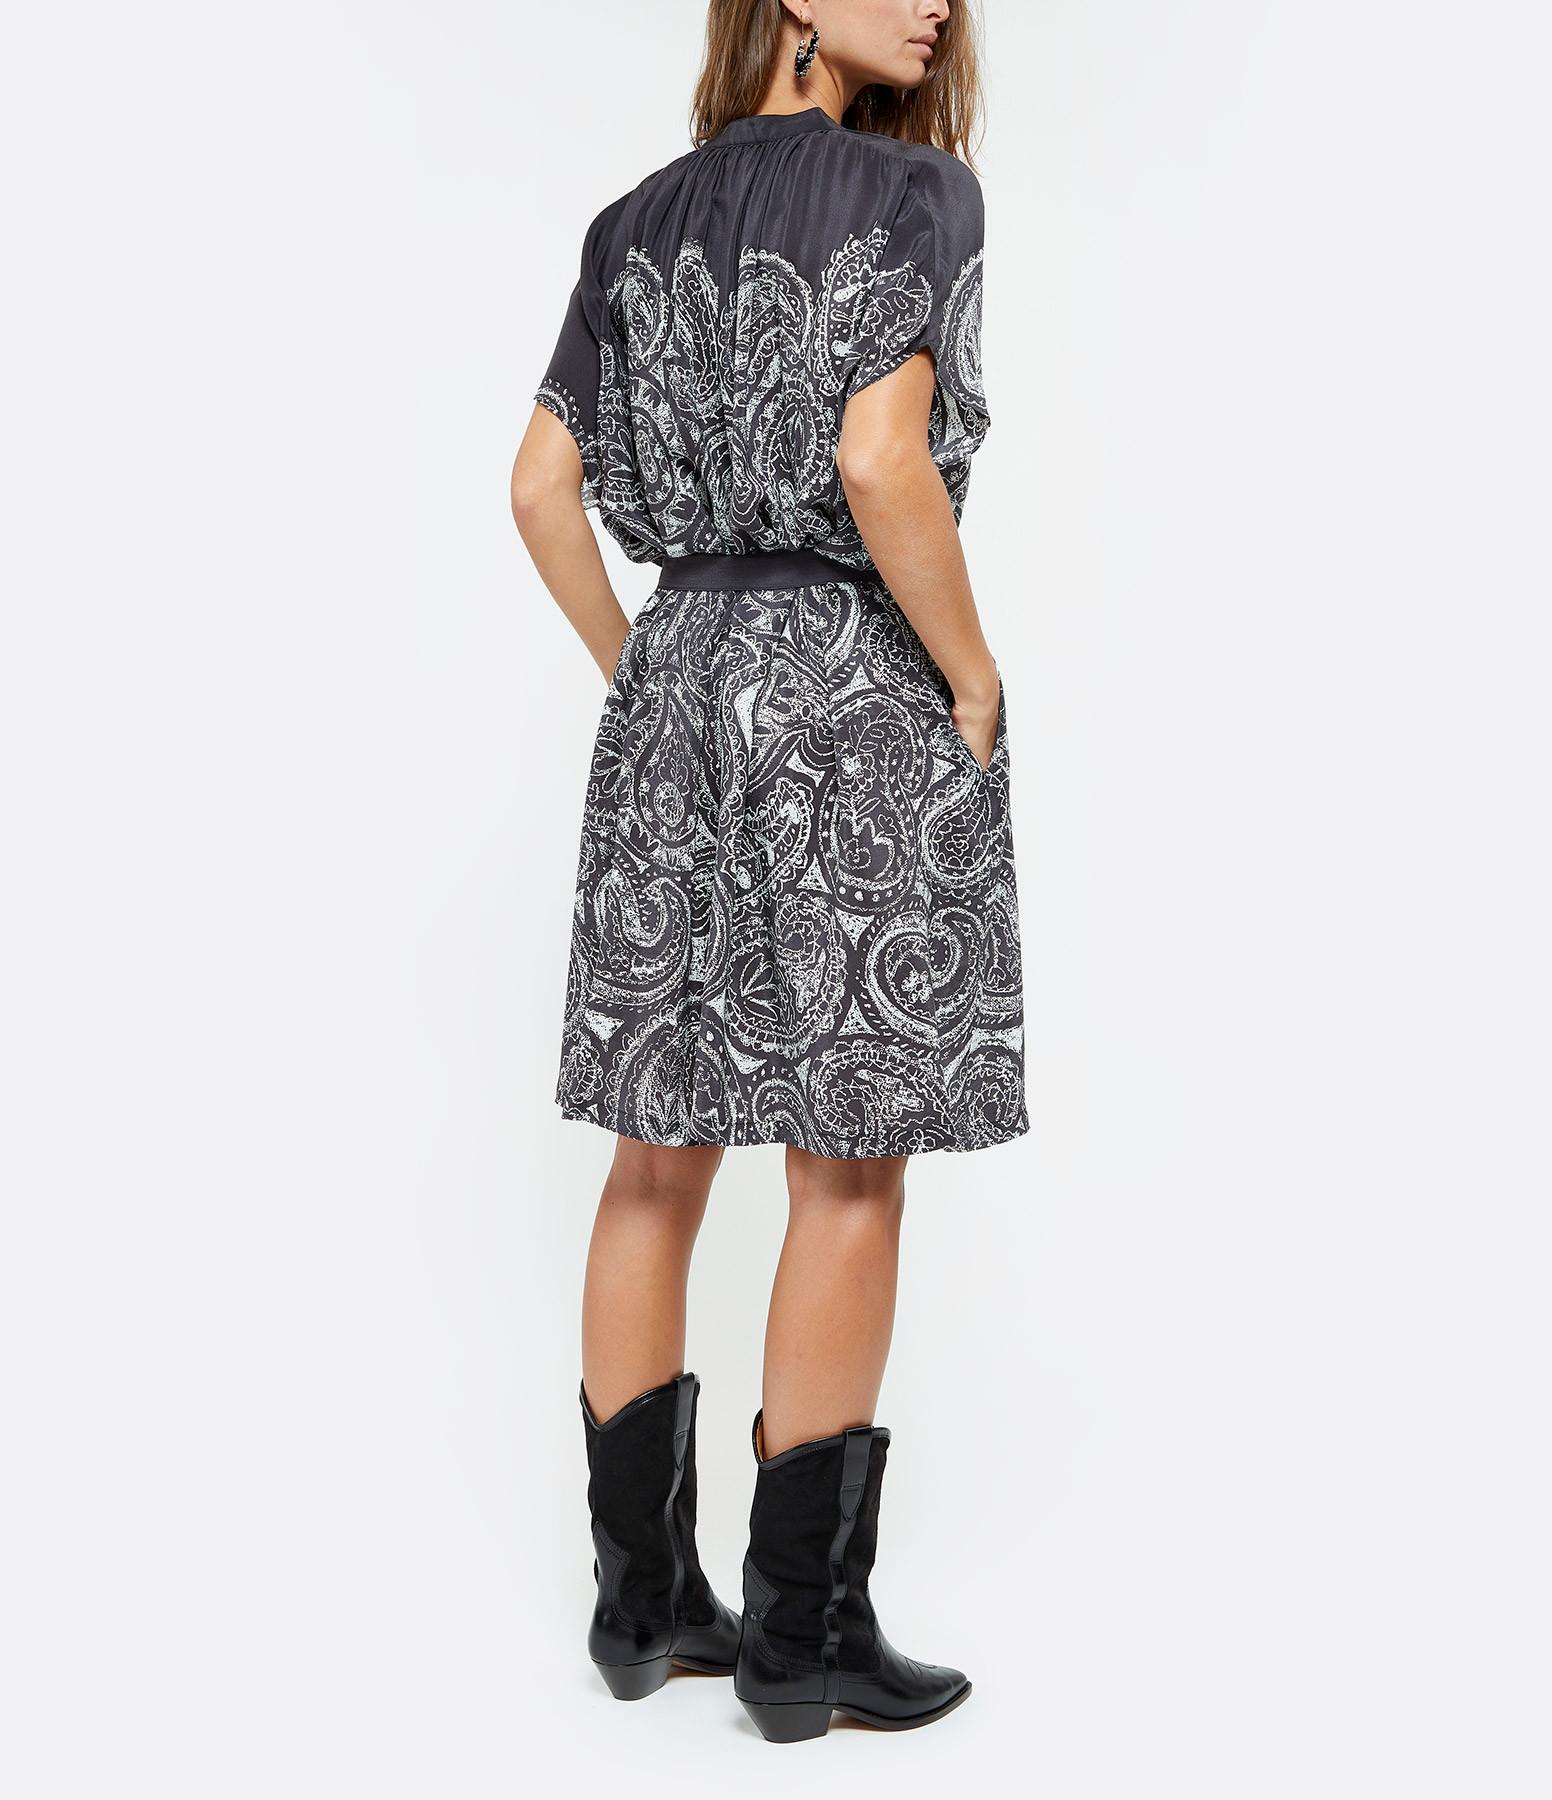 MII - Robe Oversize Imprimé Paisley Noir